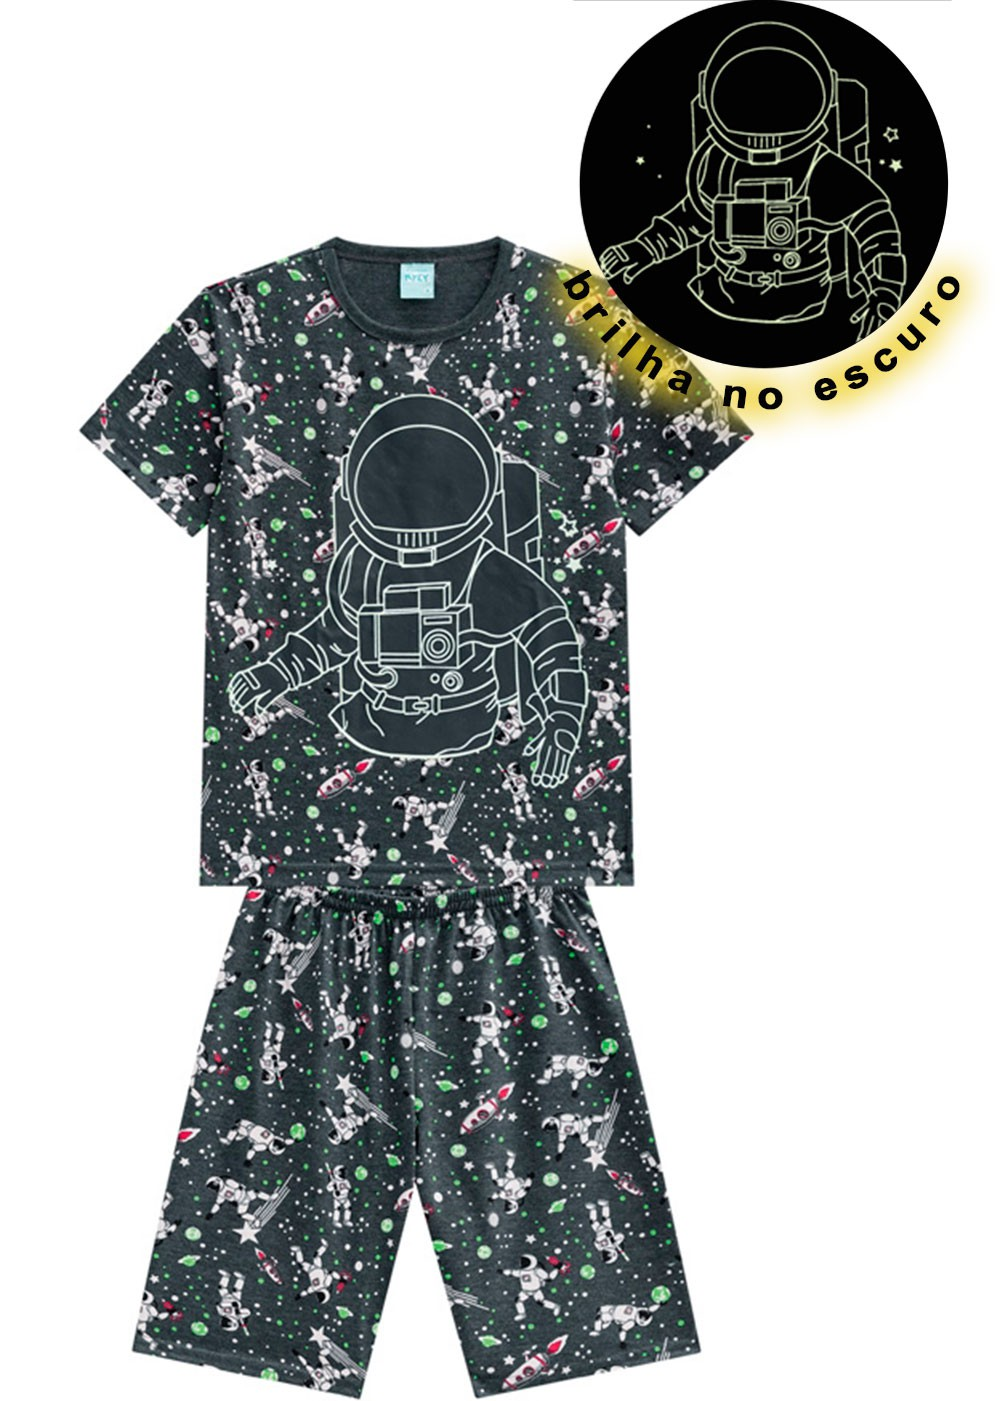 Pijama Infantil Masculino Verão Cinza Astroboy Kyly